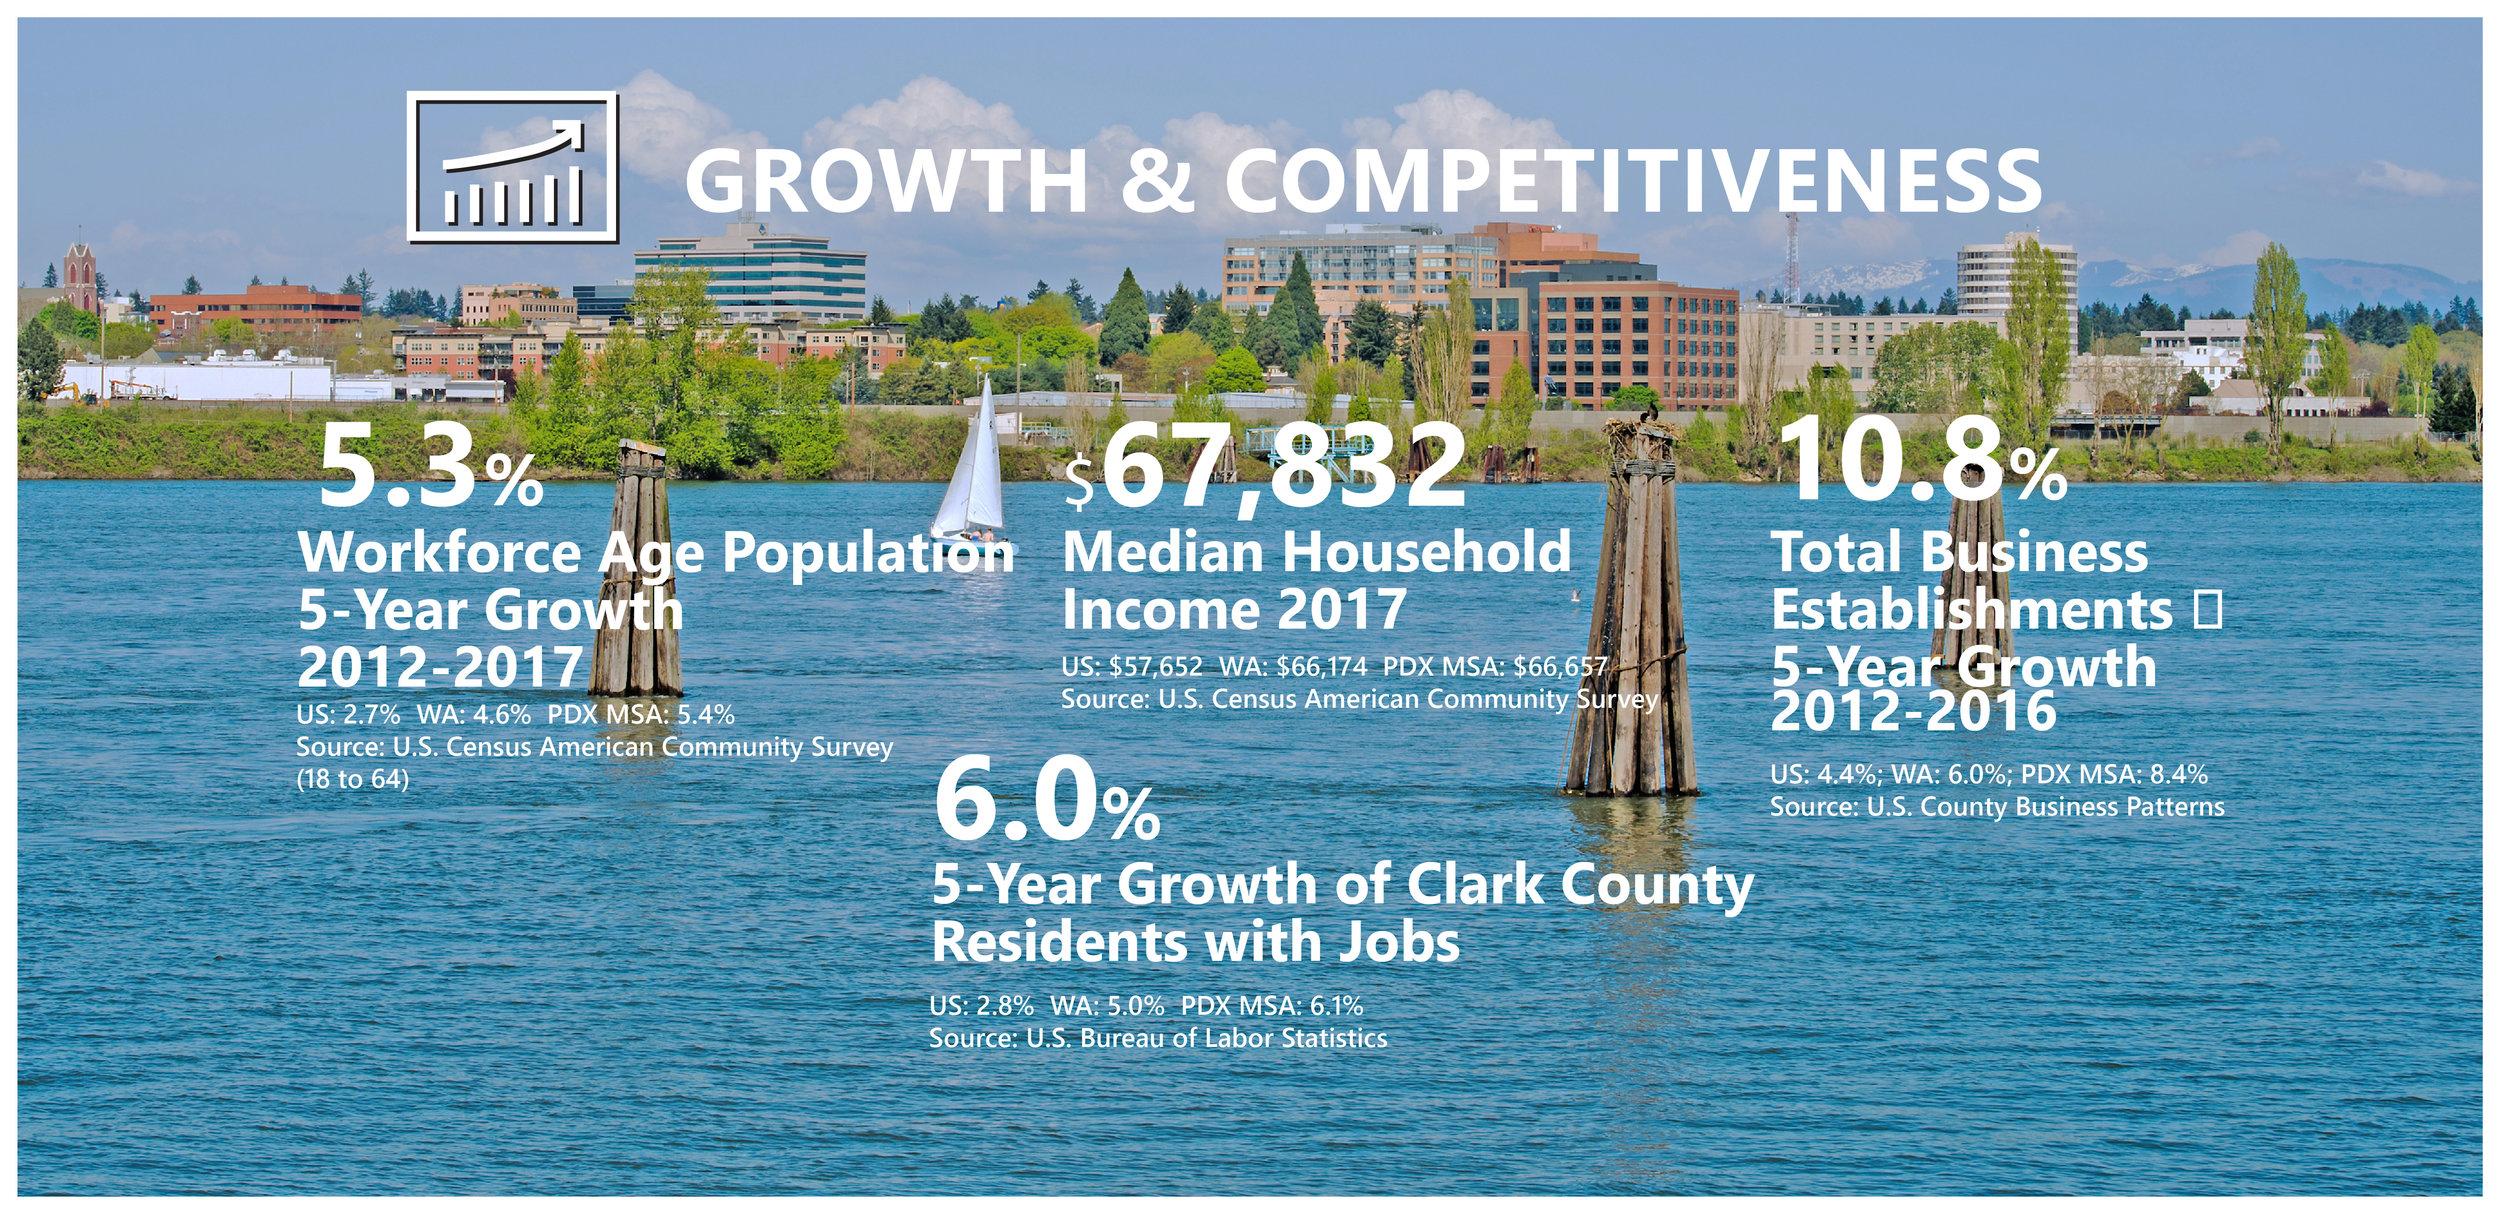 Growth & Competitivesness_FINAL-01.jpg